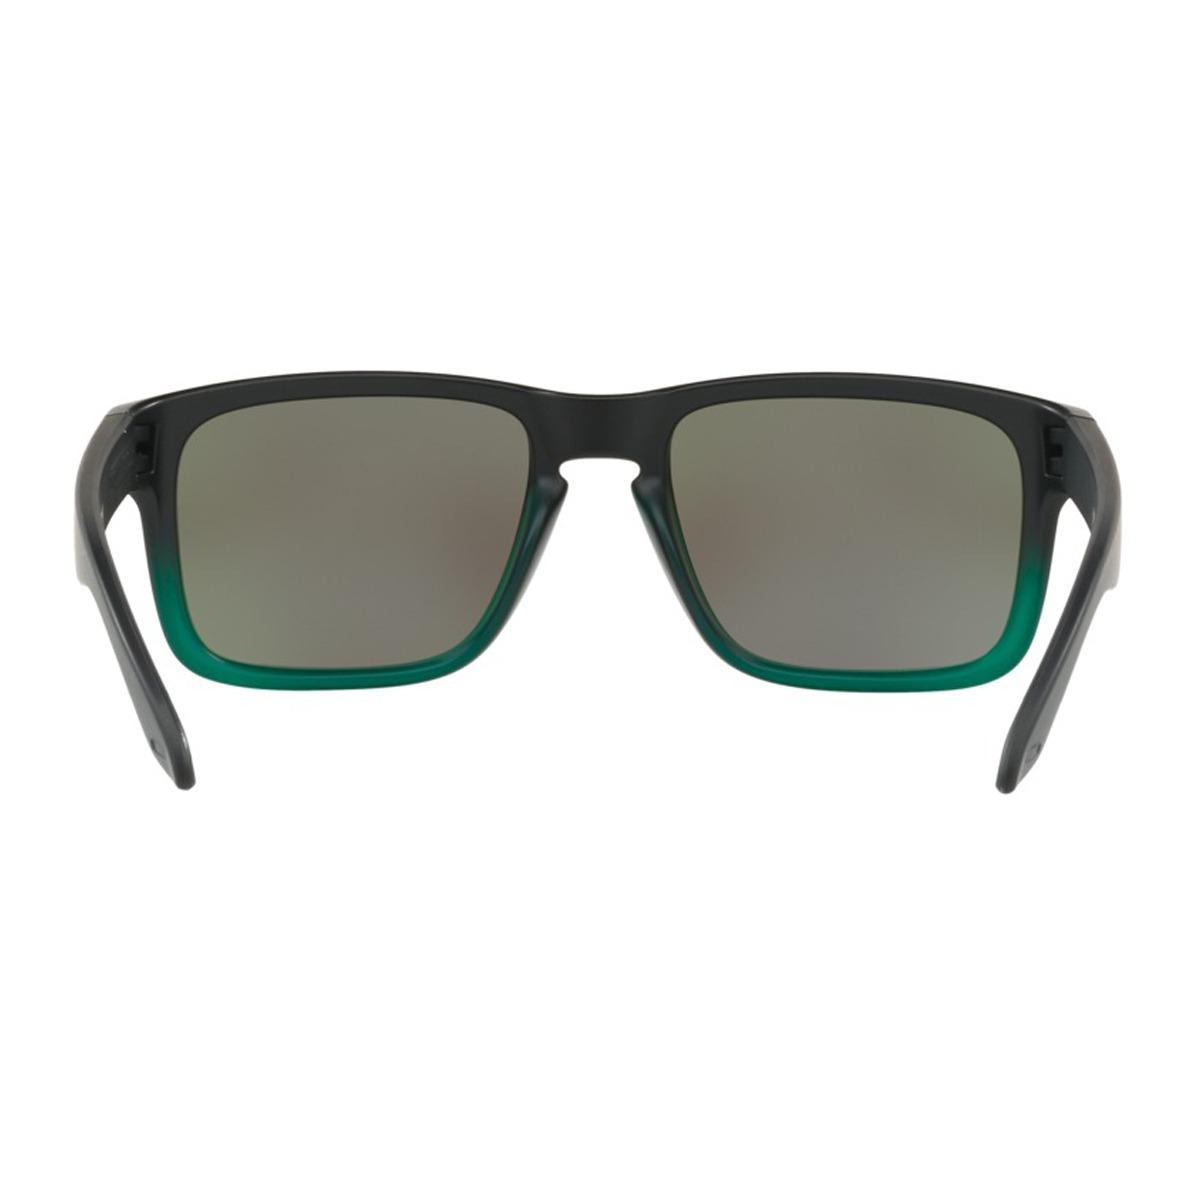 5f2036ded8330 Óculos Oakley Holbrook Jade Fade  Lente Prizm Jade Iridium - R  549 ...